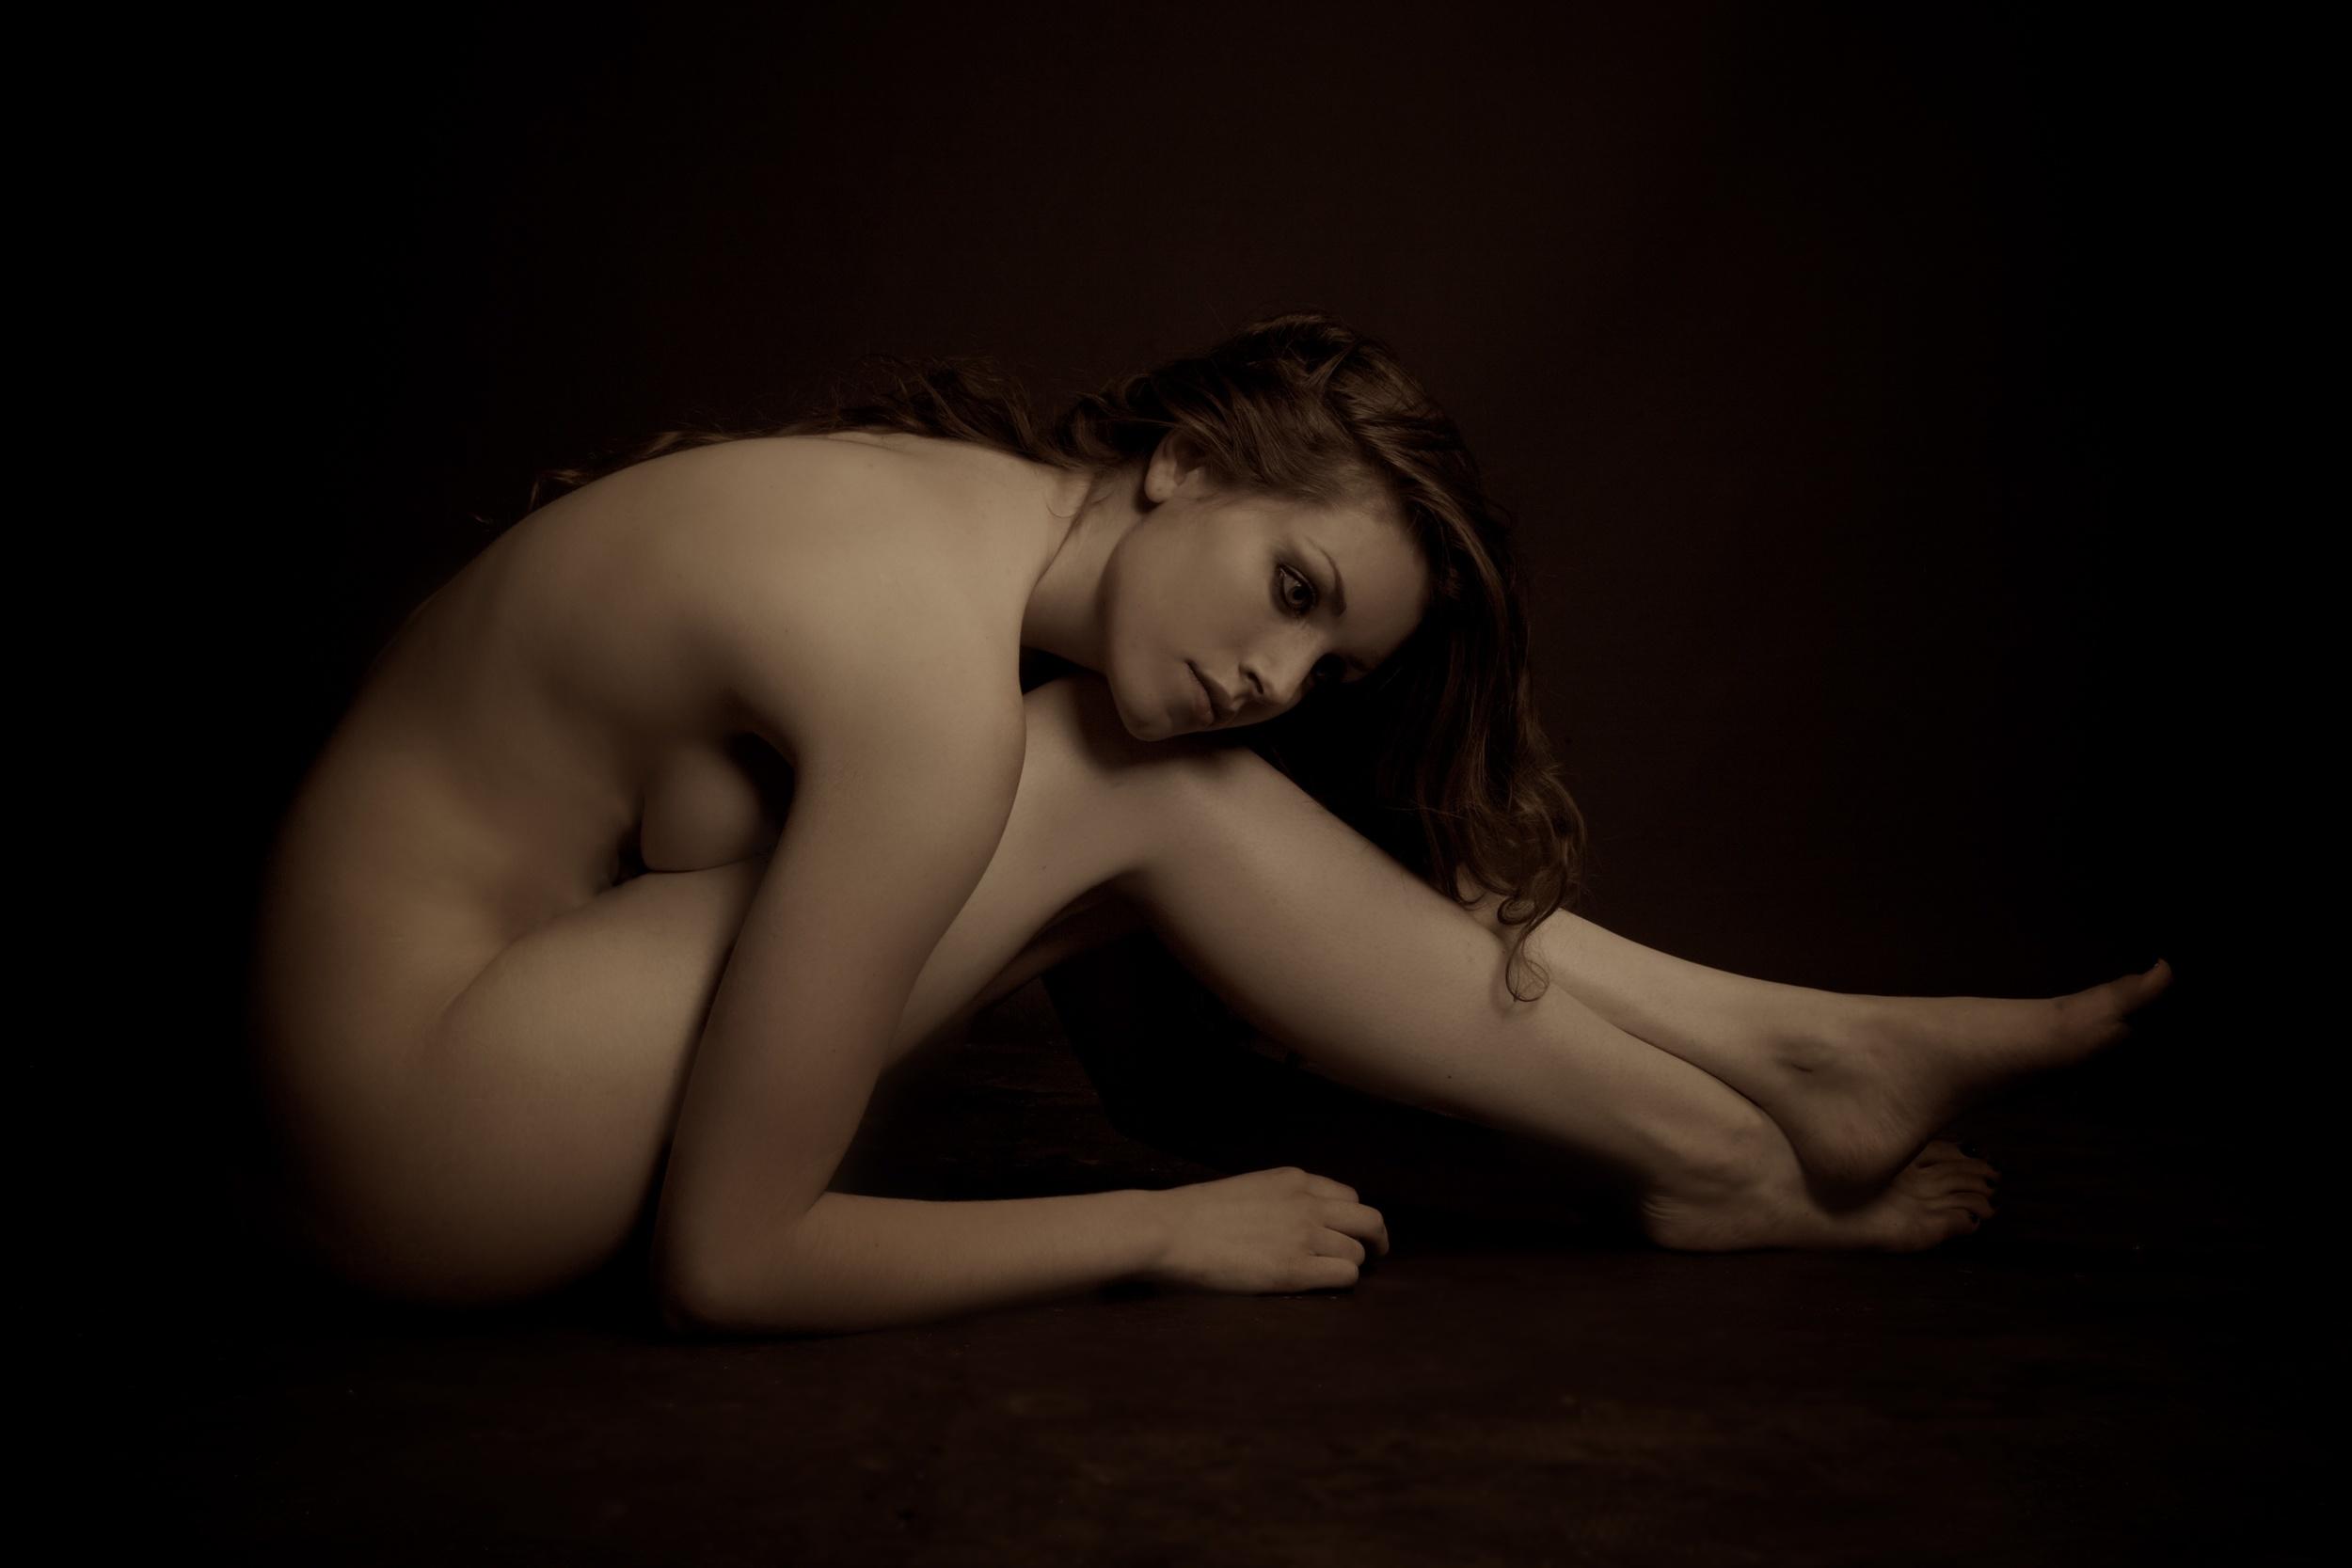 Wayne Hudson Photography, Lucria Creative, Cornwall and Devon photographer,  Launceston, photography / personal portrait / boudoir / art nude / studio / location / portrait / photo / Imagery by Hudson